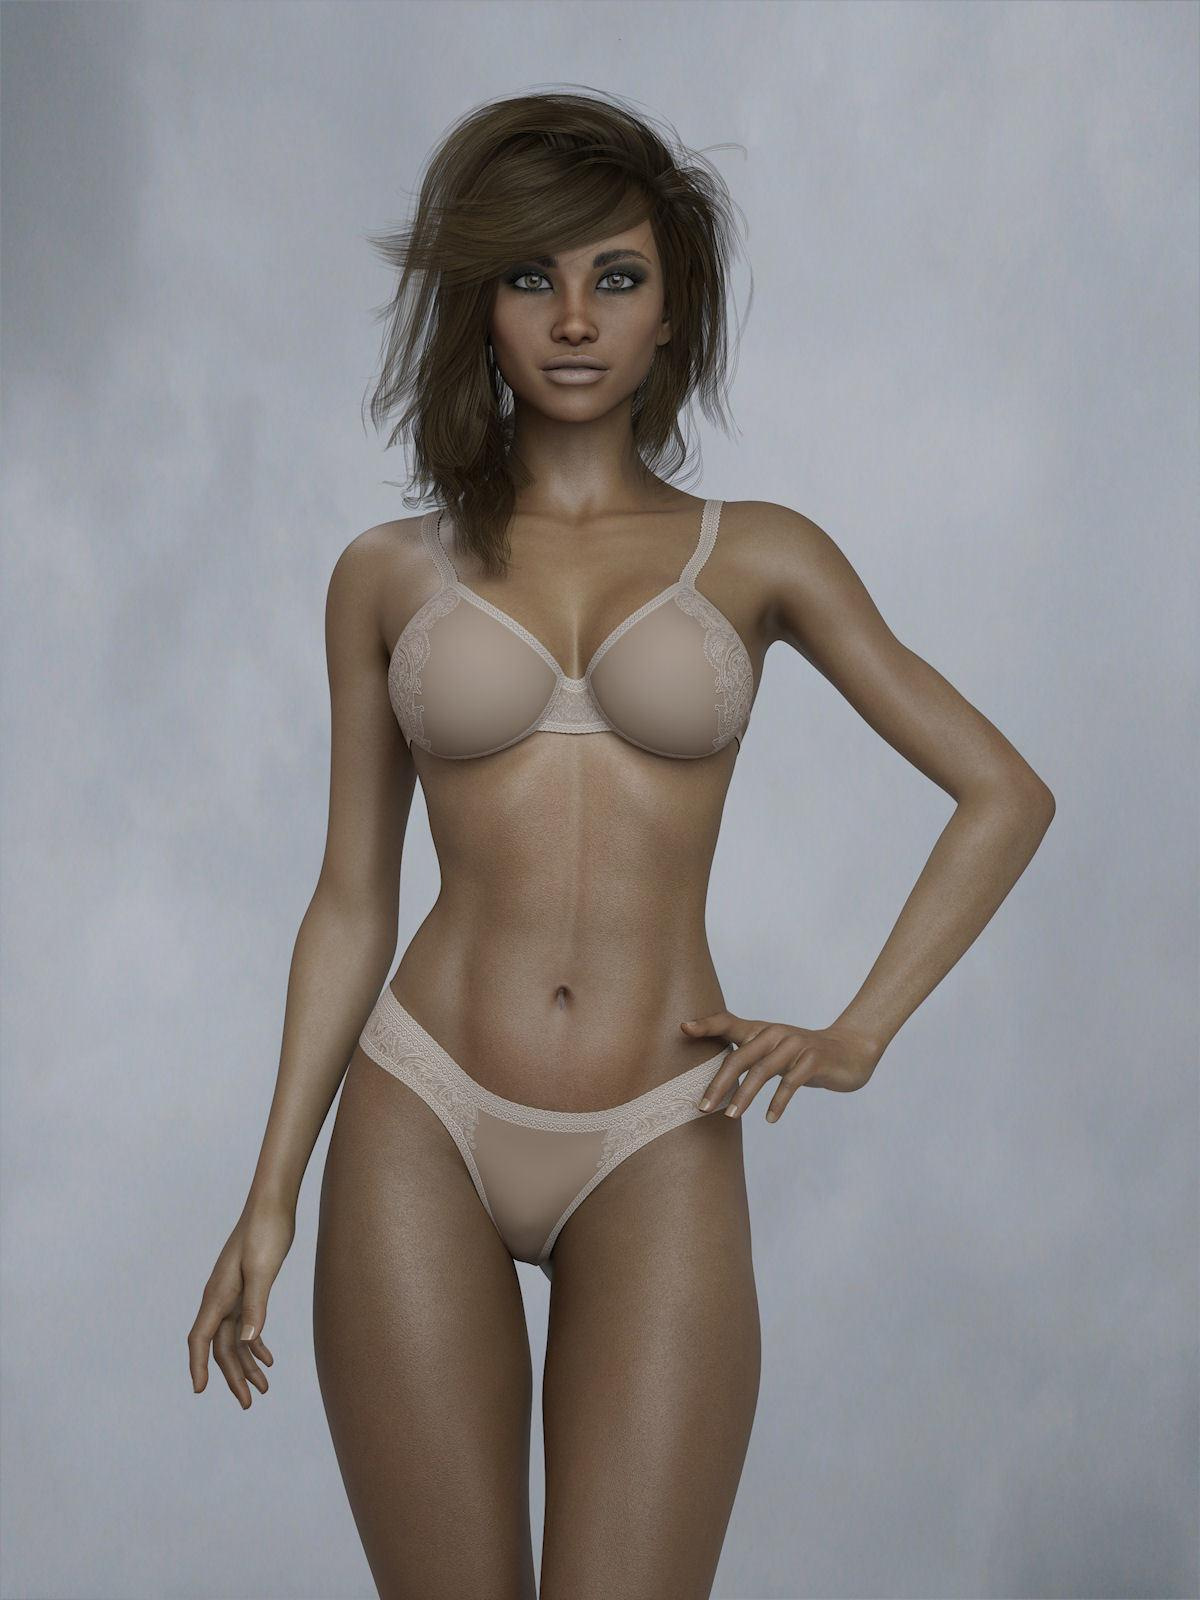 KrashWerks SYNTHIA for Genesis 8 Female